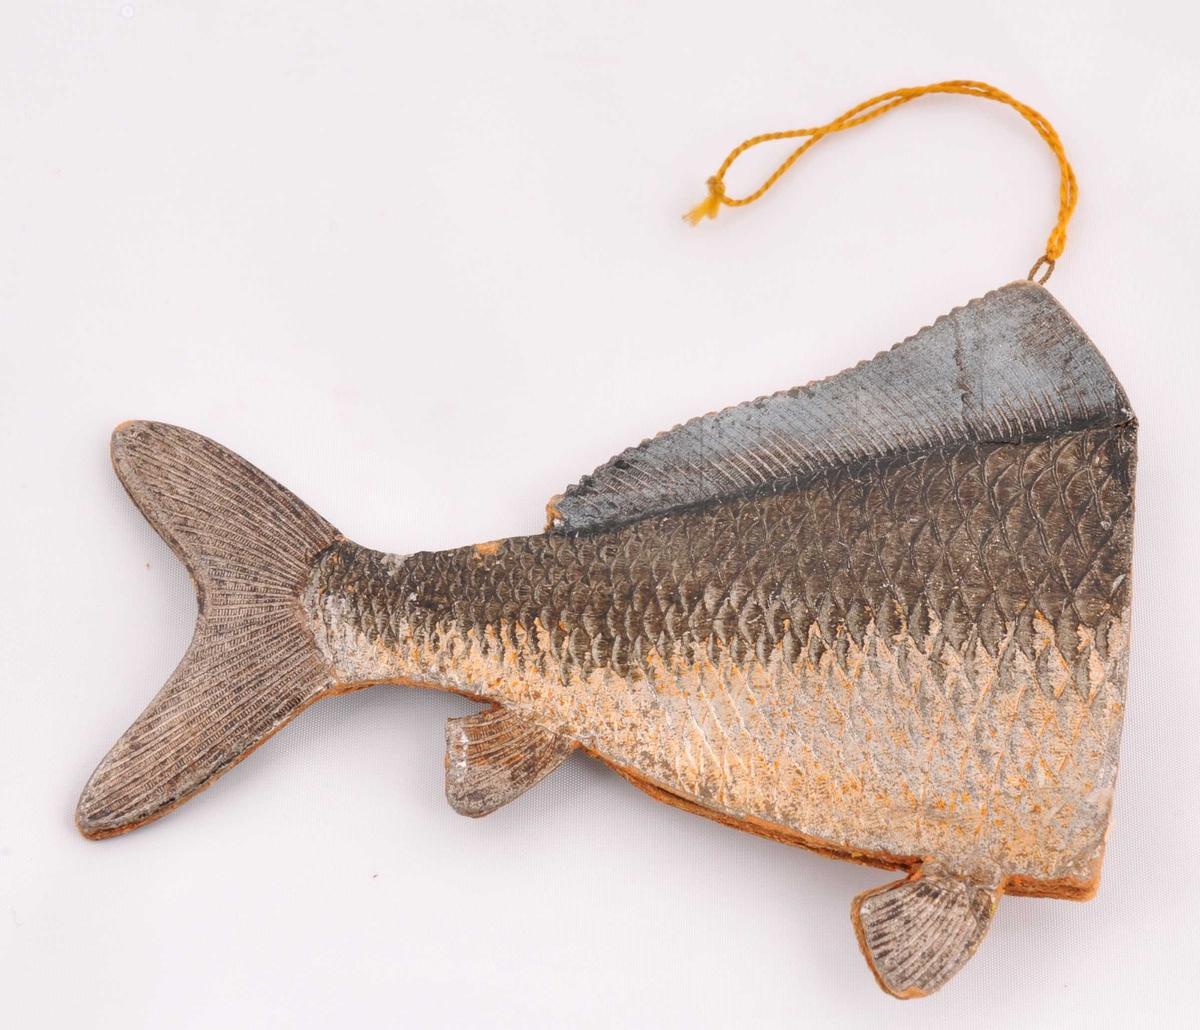 Ein halv fisk, bakparten (m/hale, og to finnar), med snor for oppheng.